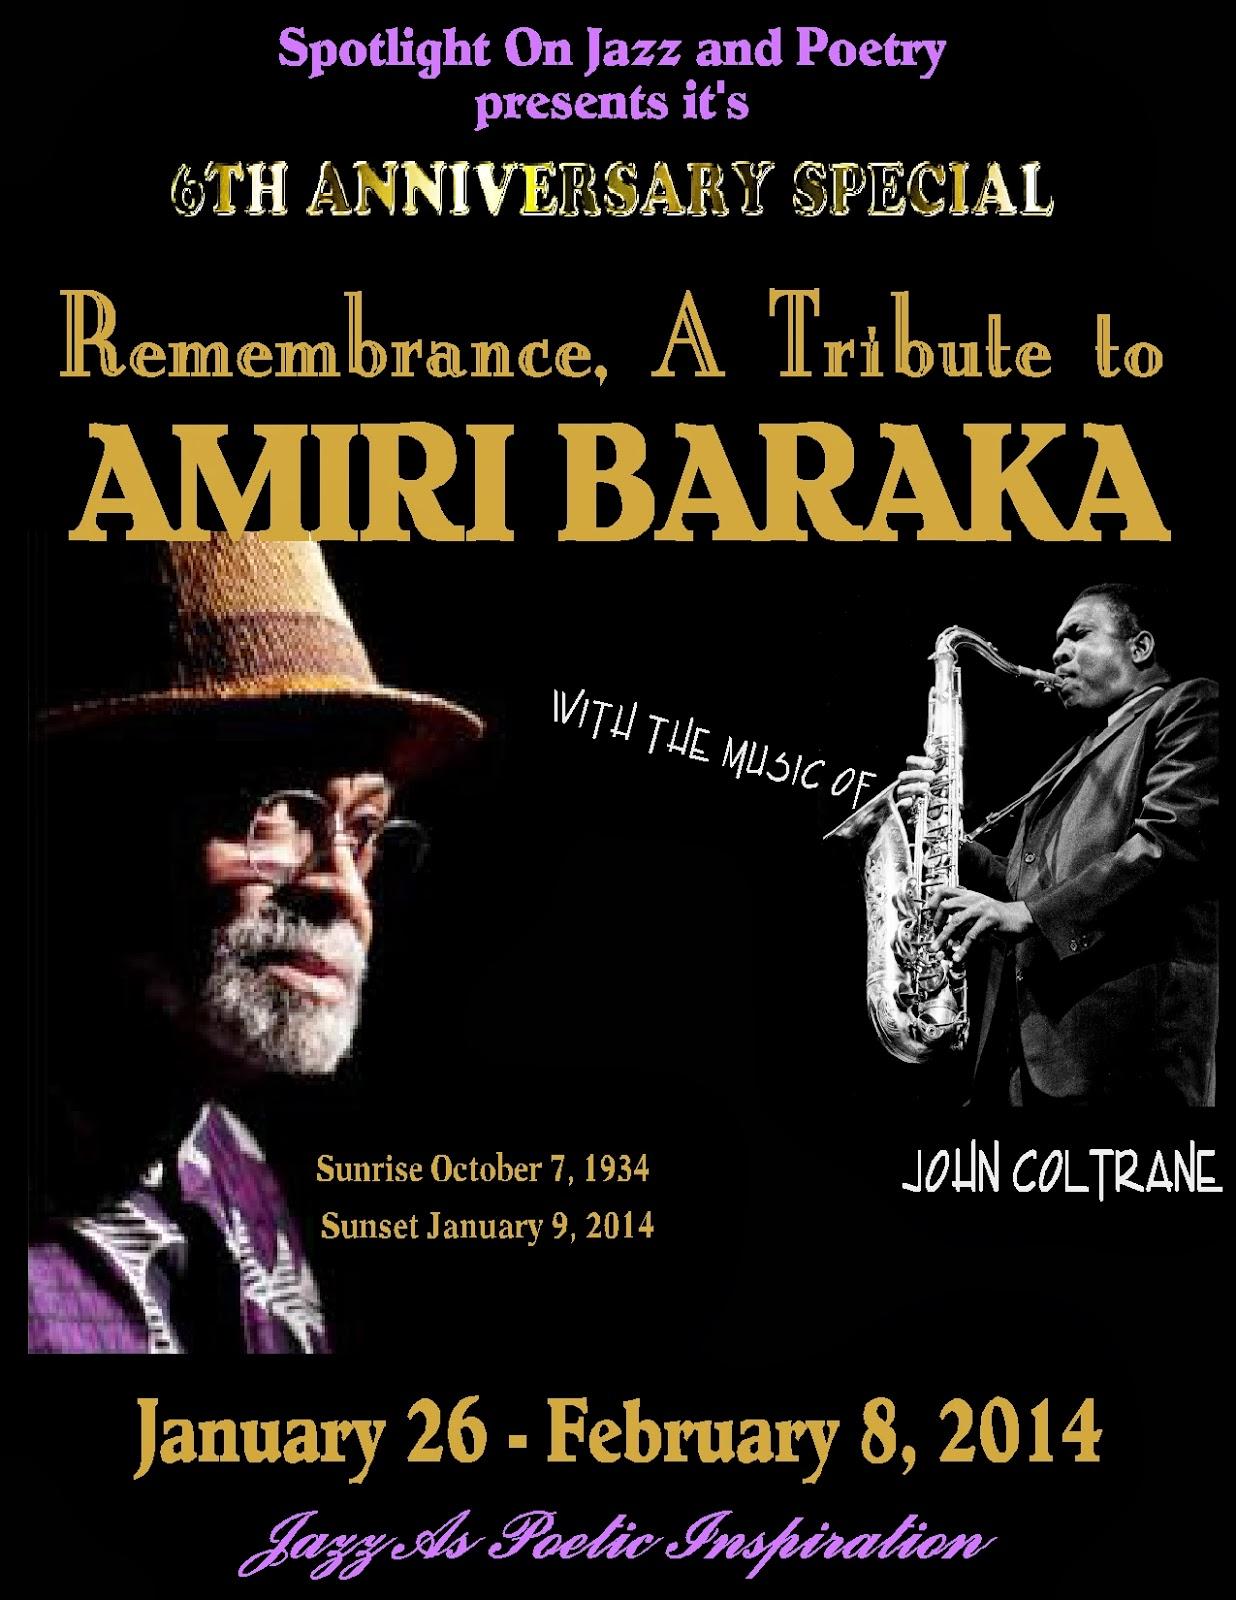 baraka essay the black arts movement and cap springer jazz what  baraka essay baraka college essay shamhoon term paper